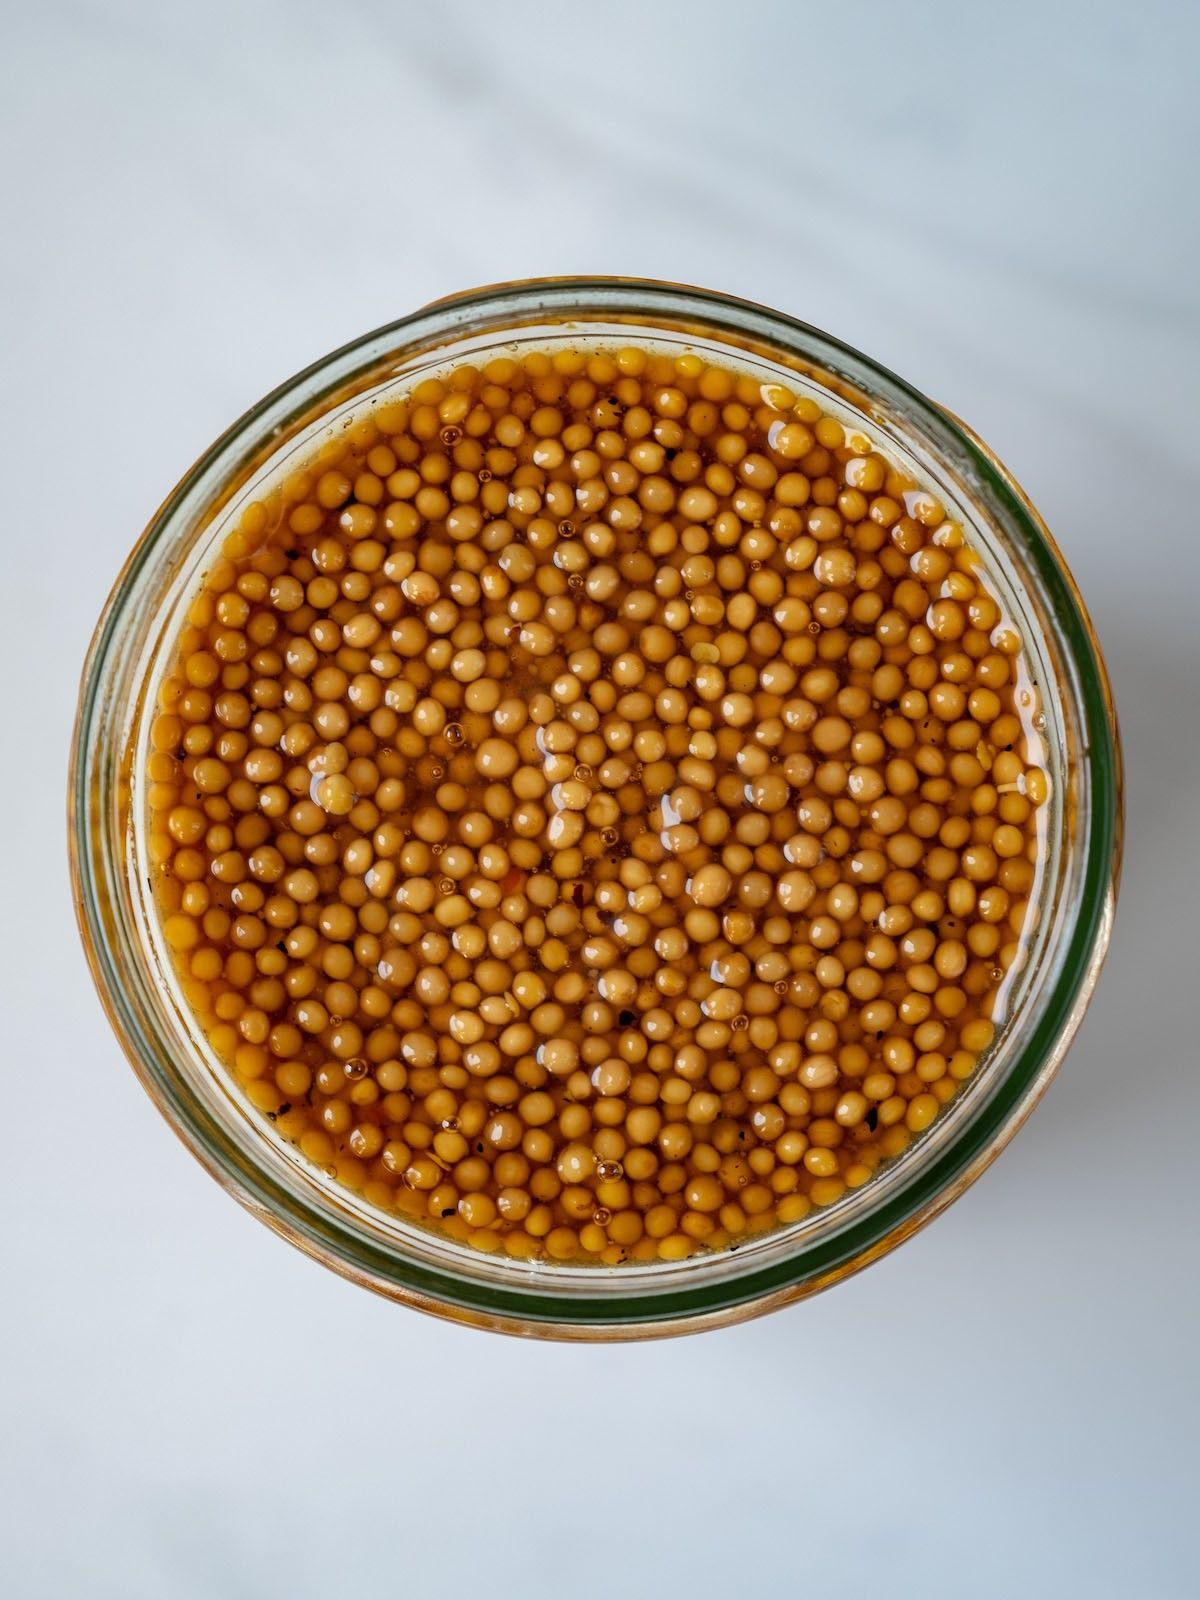 Rezept, Foodblog, Abput Fuel, Senfcaviar, Senfkörner, Senfsaat